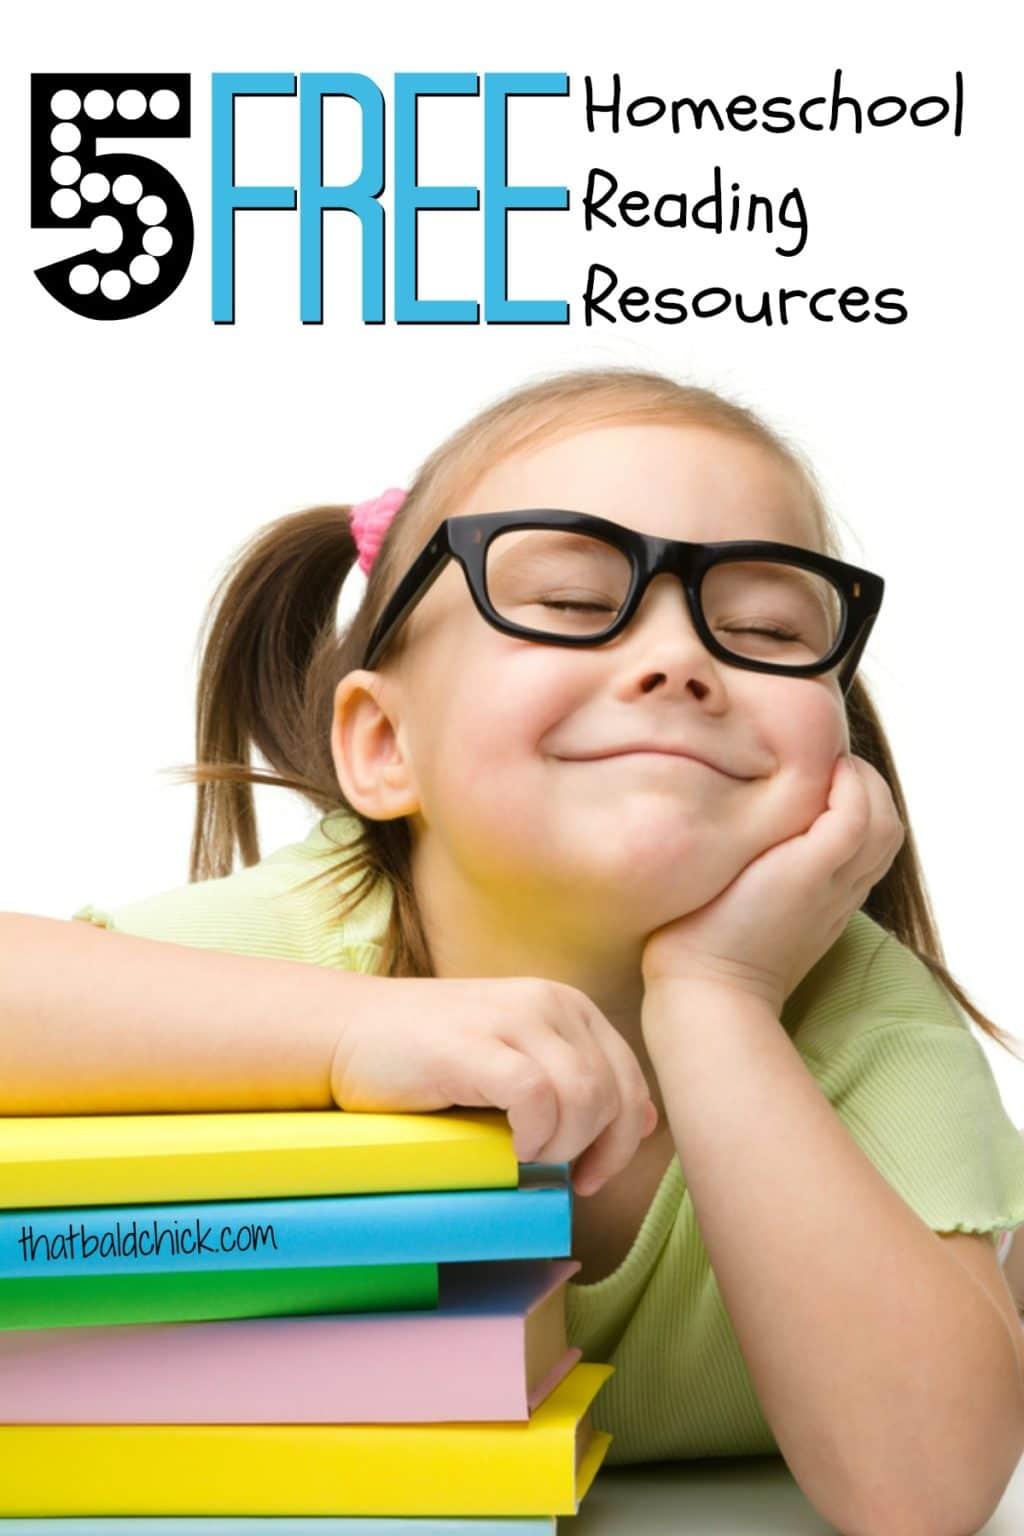 5 free homeschool reading resources via @thatbaldchick